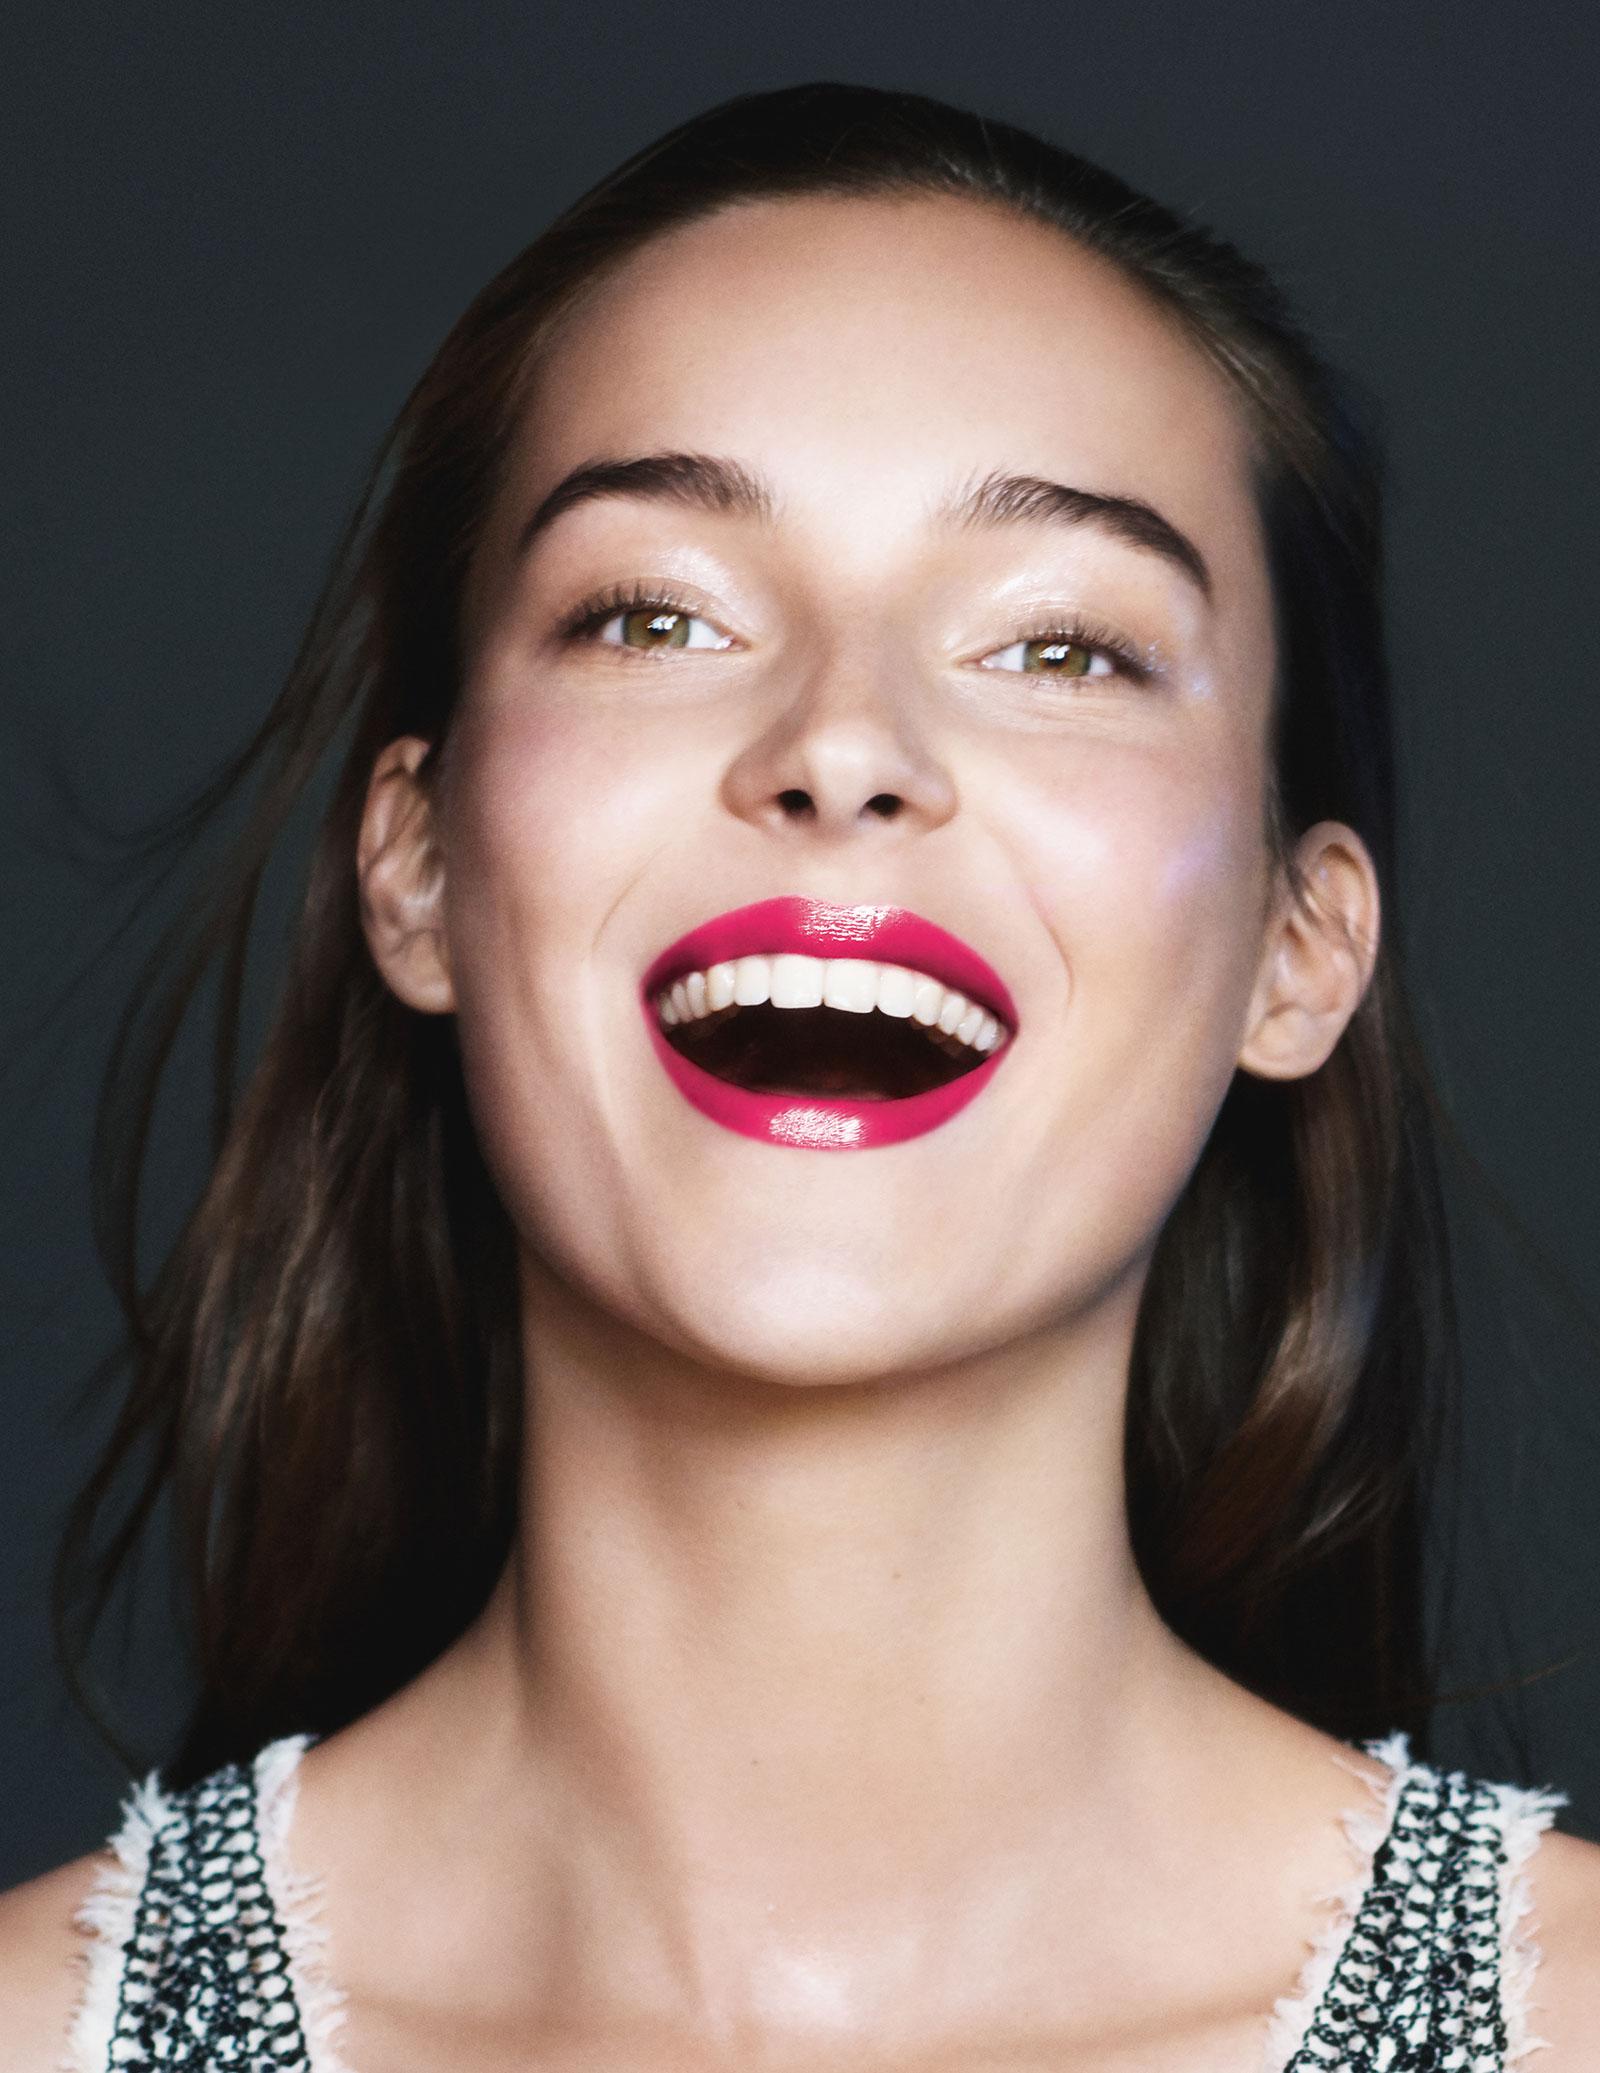 Armani-Ecstasy-shine-lipstick-beauty